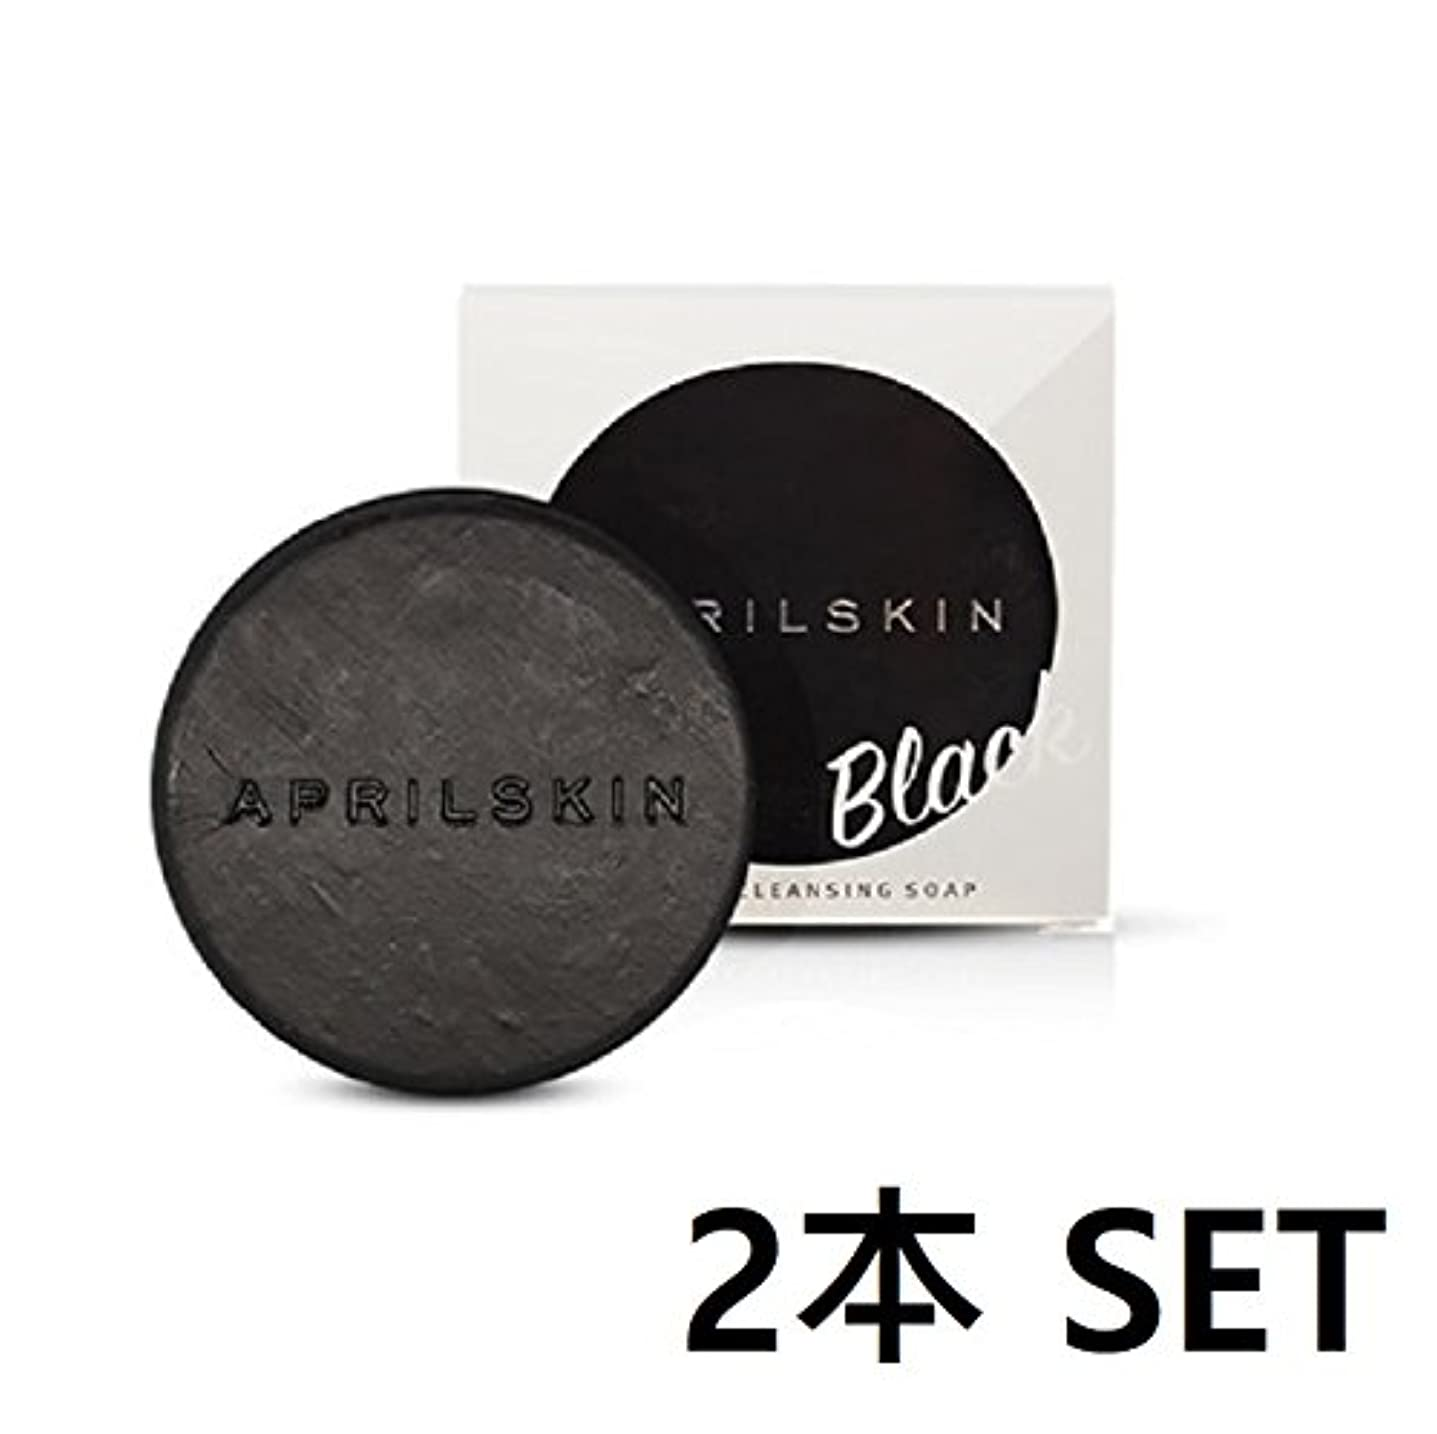 [APRILSKIN] エイプリルスキン国民石鹸 BLACK X 2pcs SET(APRIL SKIN magic stone マジックストーンのリニューアルバージョン新発売) (BLACK) [並行輸入品]